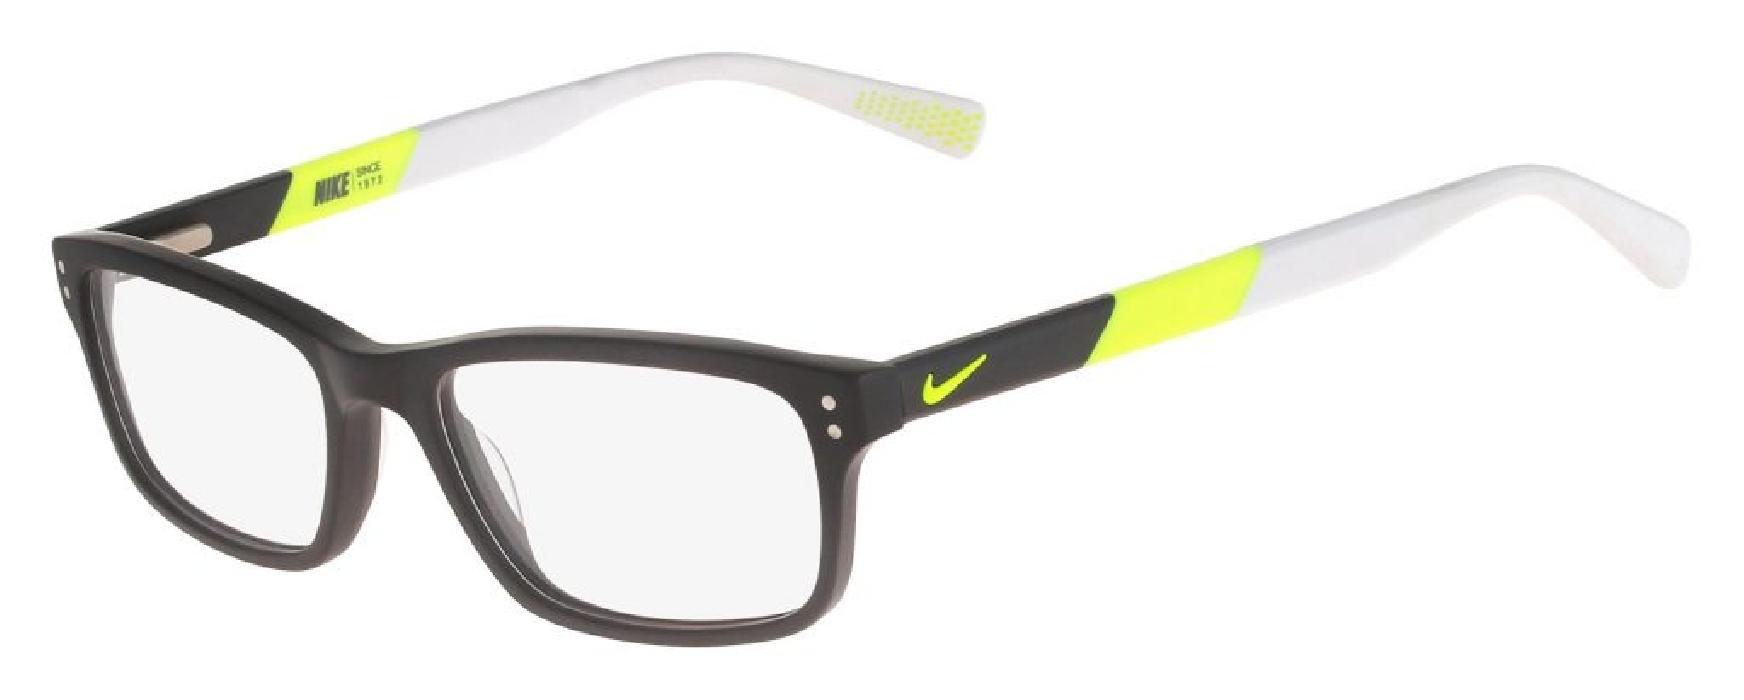 An image of Nike 7237 Matte Dark Grey-Volt